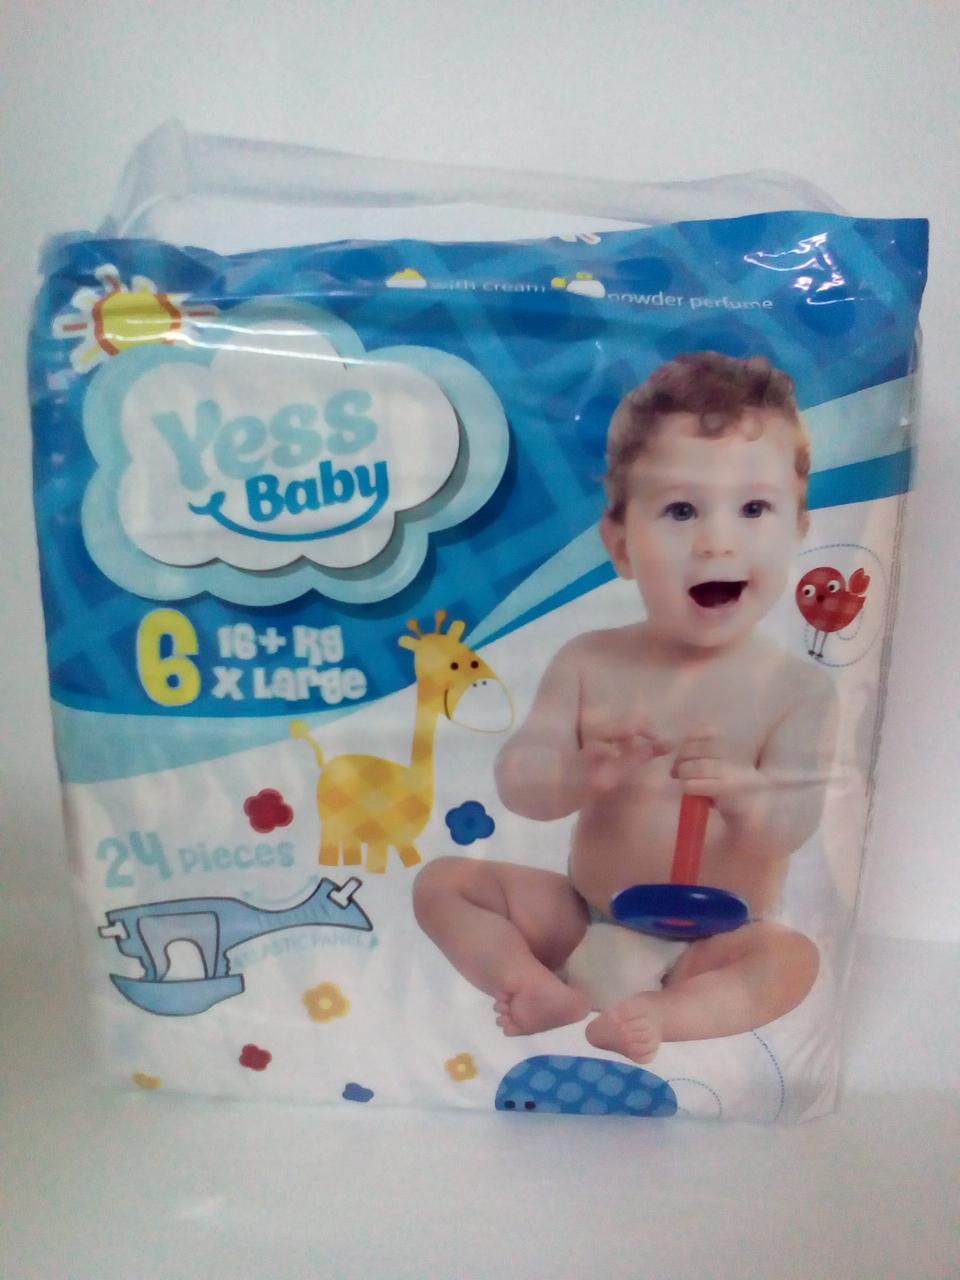 Подгузники Yess Baby Super 6 X Large 16+кг (24 шт) (4902)